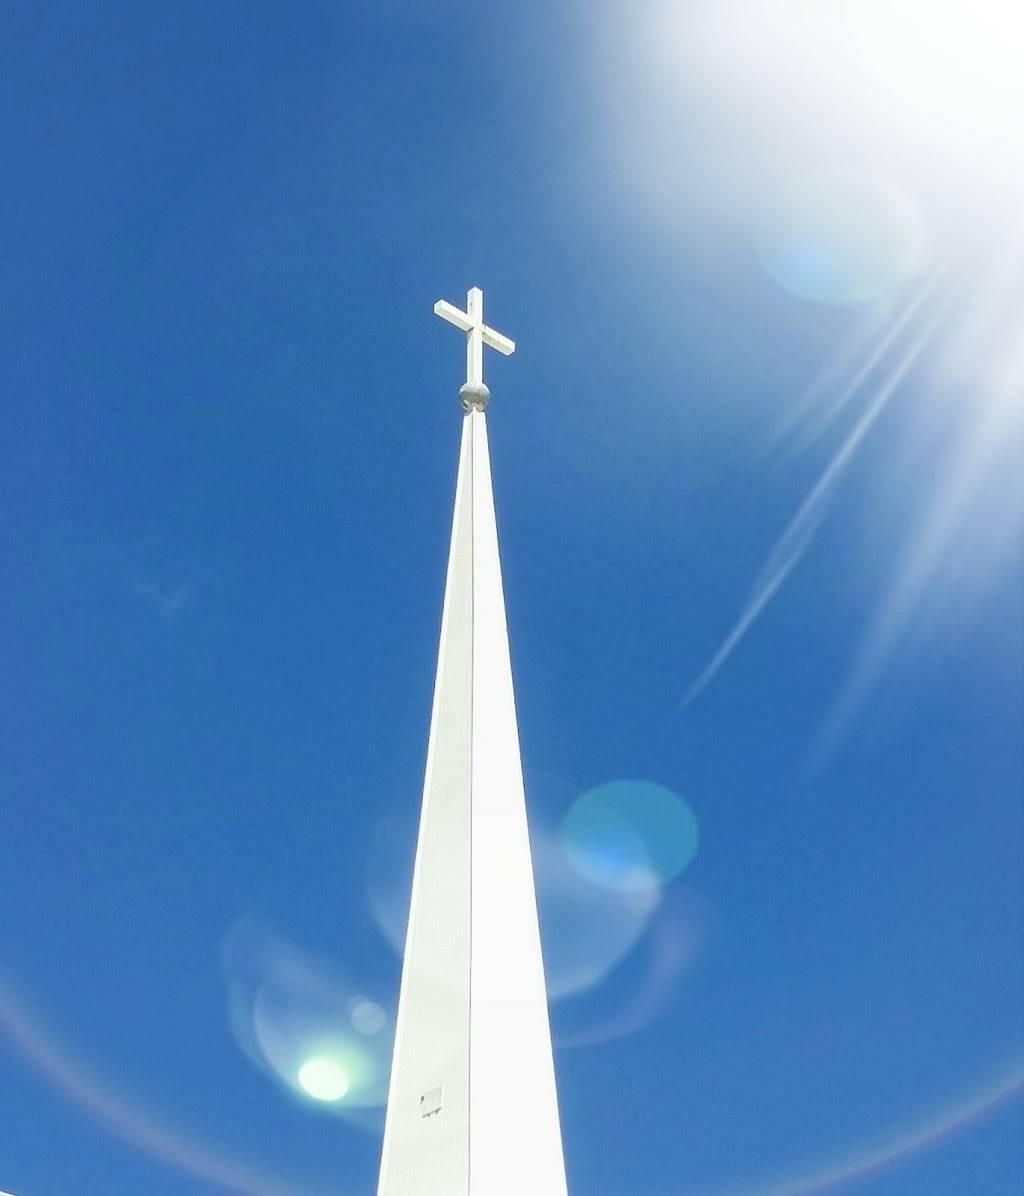 Vietnamese Baptist Church of Arlington - church  | Photo 8 of 10 | Address: 4515 SW Green Oaks Blvd, Arlington, TX 76017, USA | Phone: (817) 478-7592